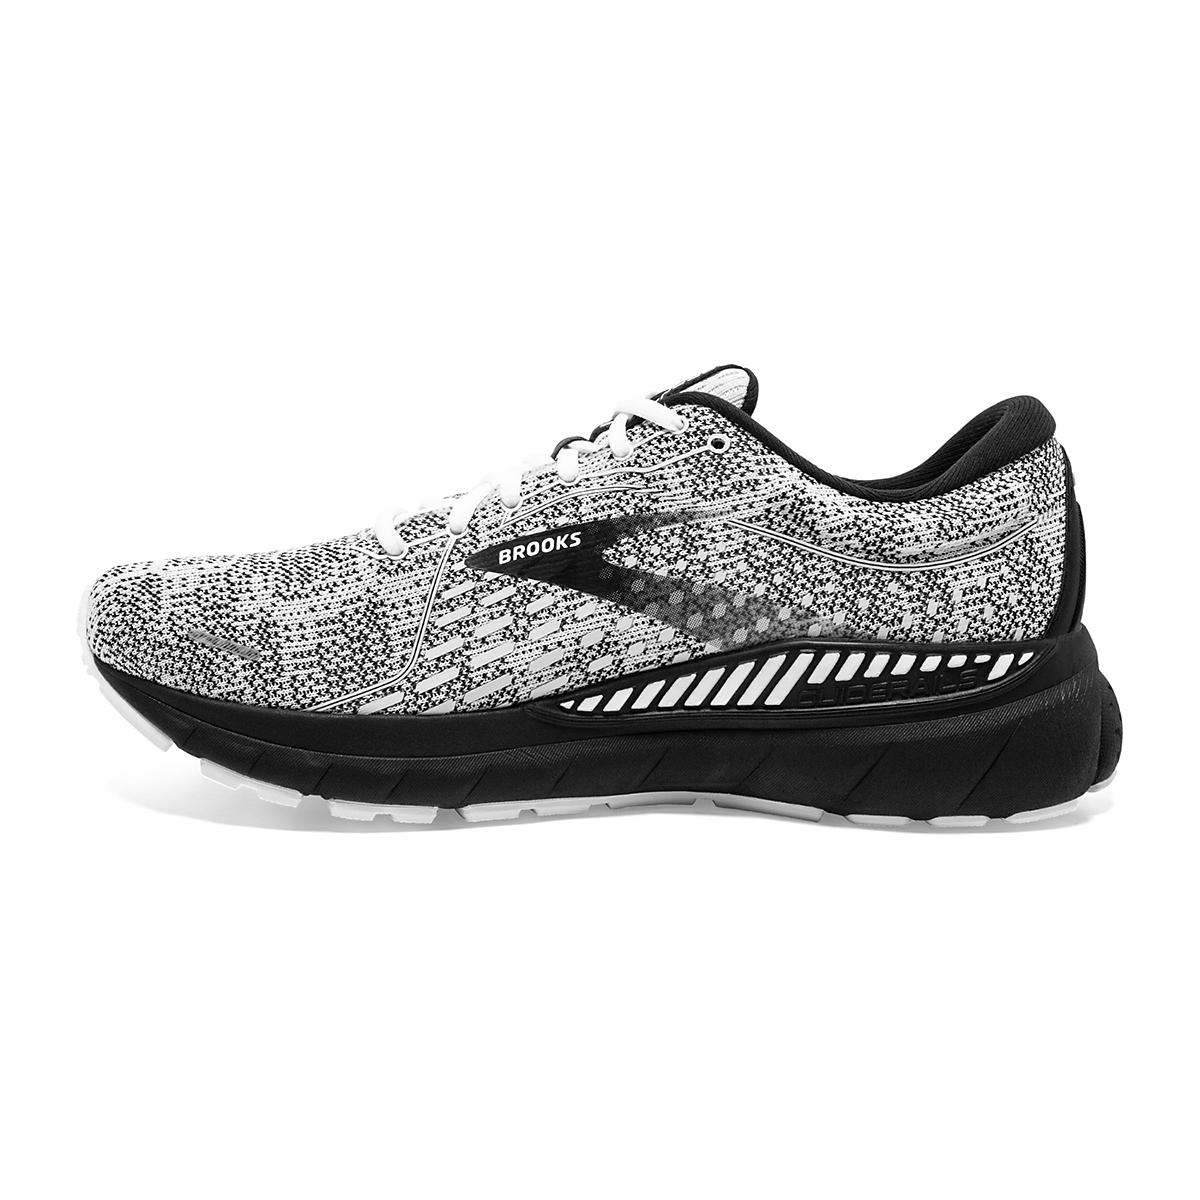 Women's Brooks Adrenaline GTS 21 Running Shoe - Color: White/Grey/Black - Size: 7.5 - Width: Regular, White/Grey/Black, large, image 2